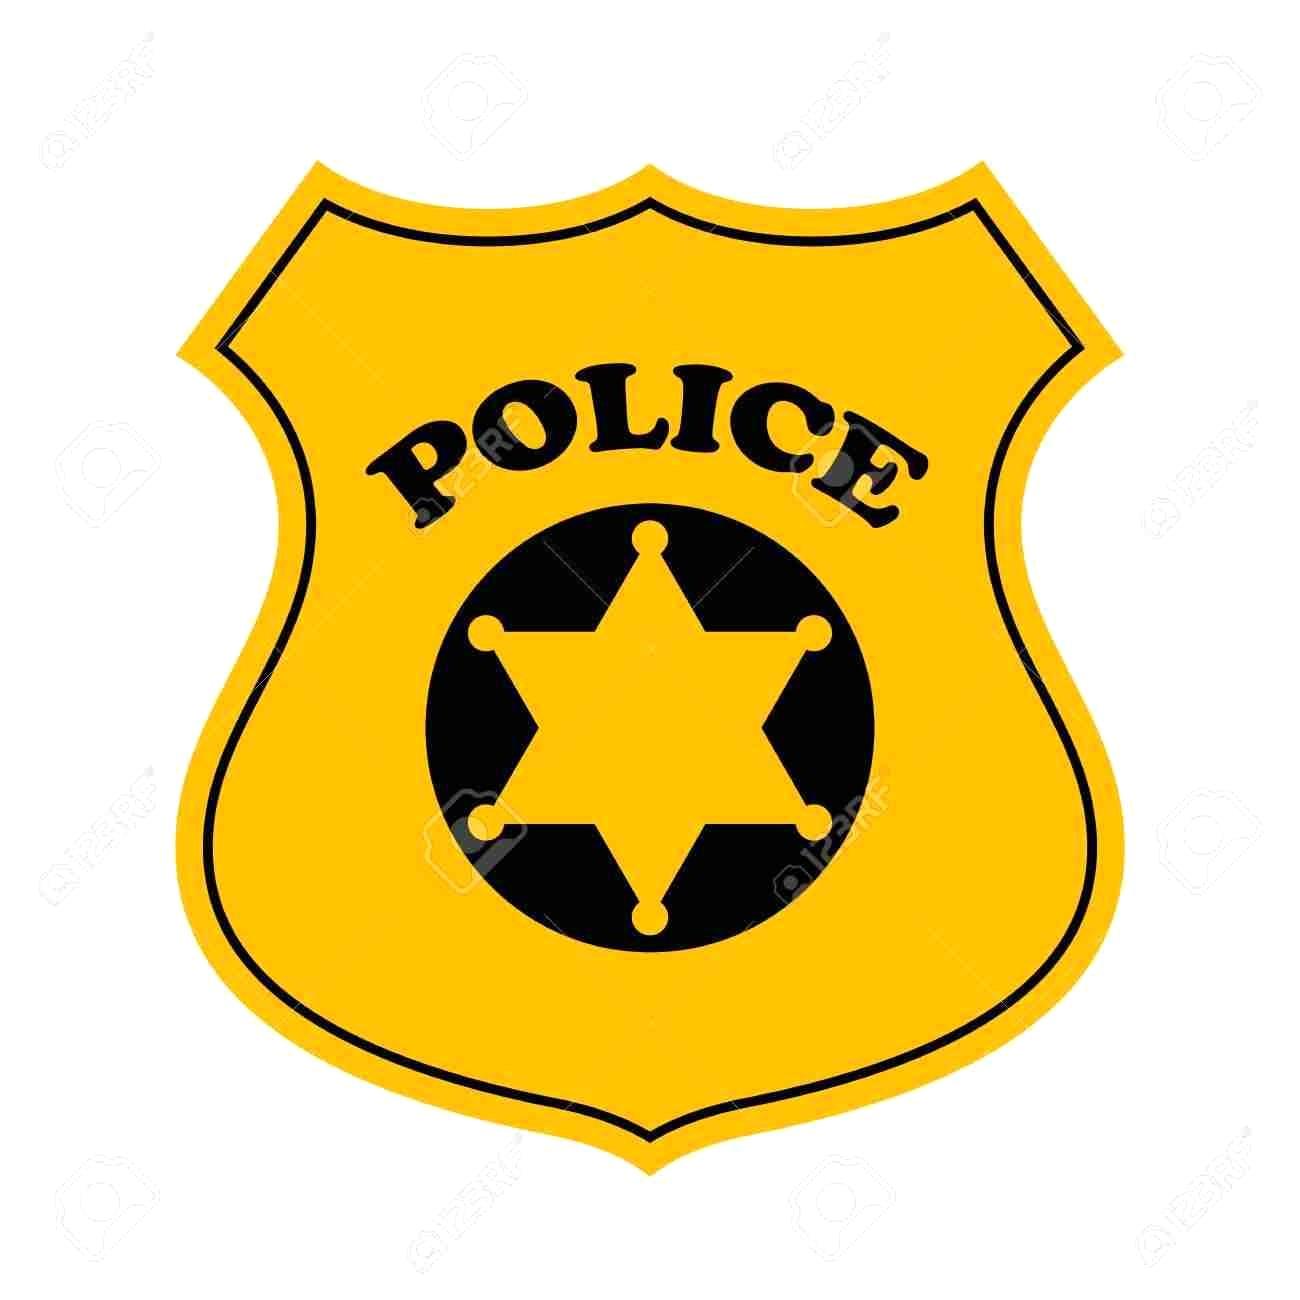 Badge clipart police officer. Station